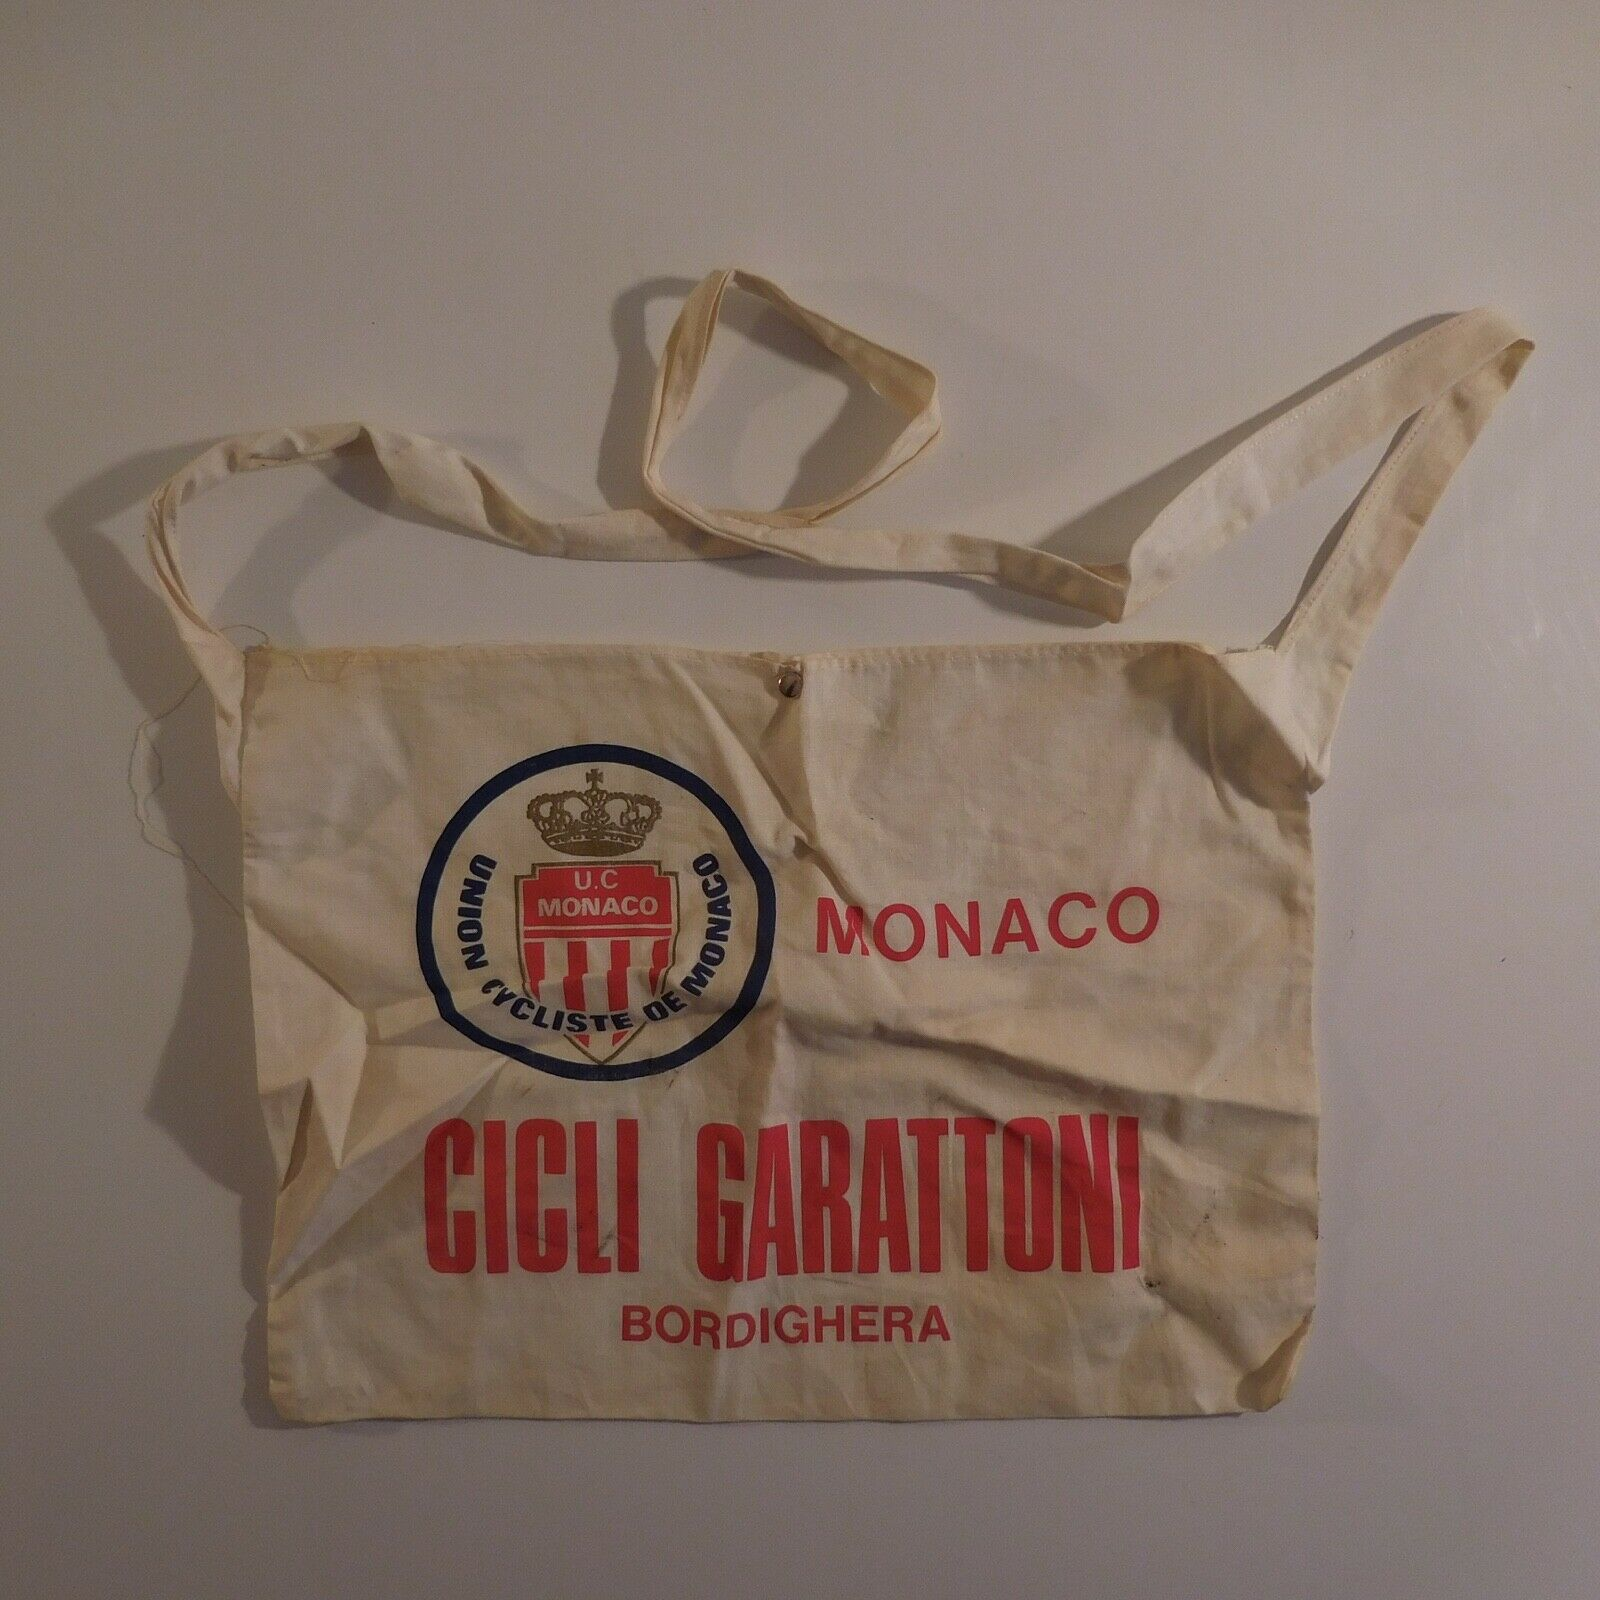 Musette coureur Union Cycliste Monaco 1984 GARATTONI BORDIGHERA Italie N3653